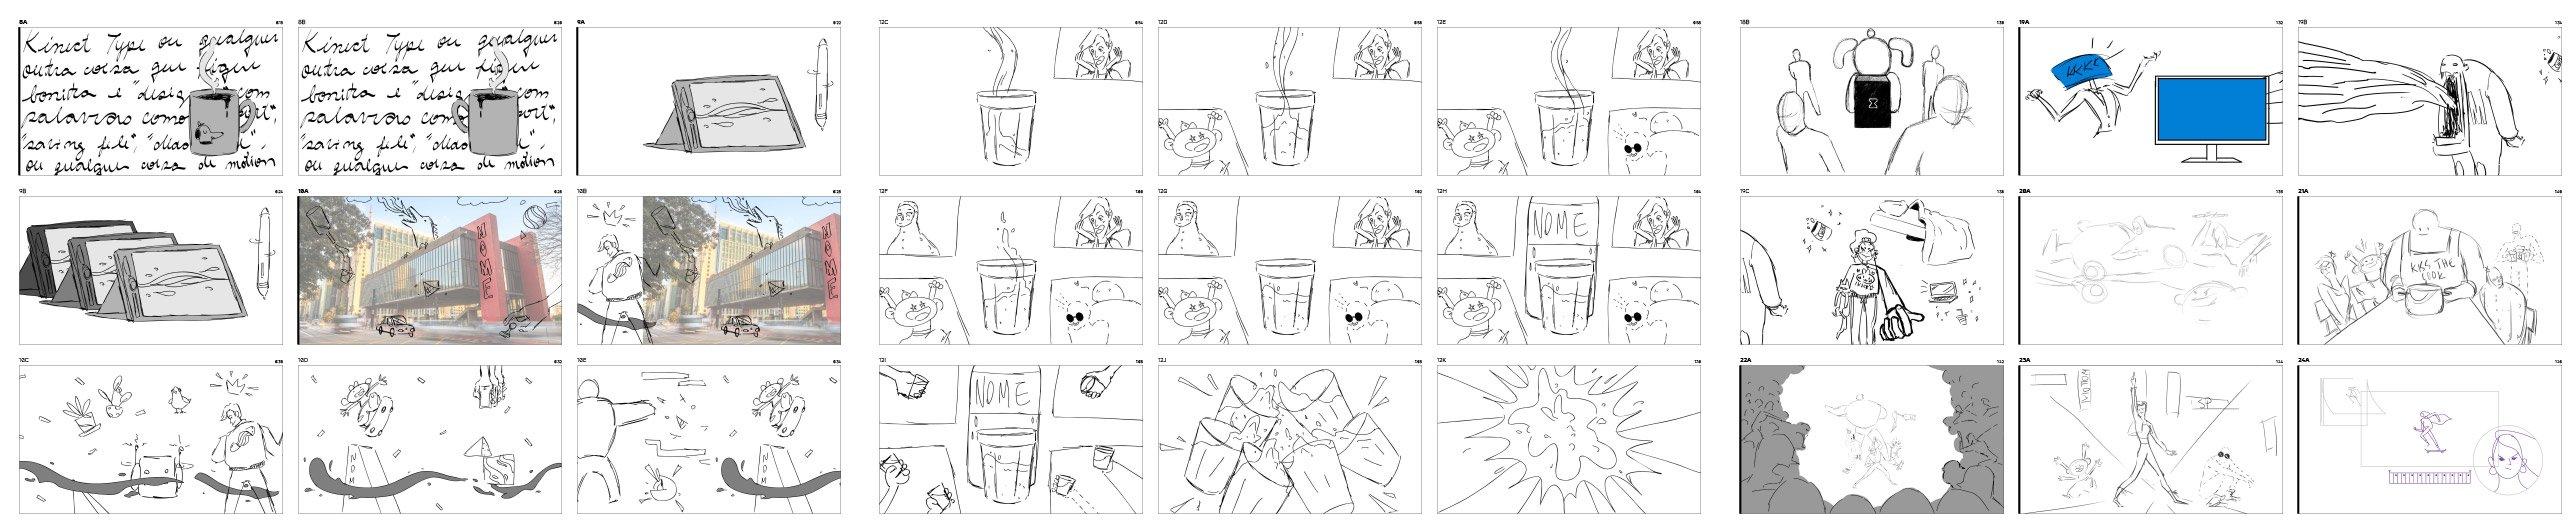 storyboard-example